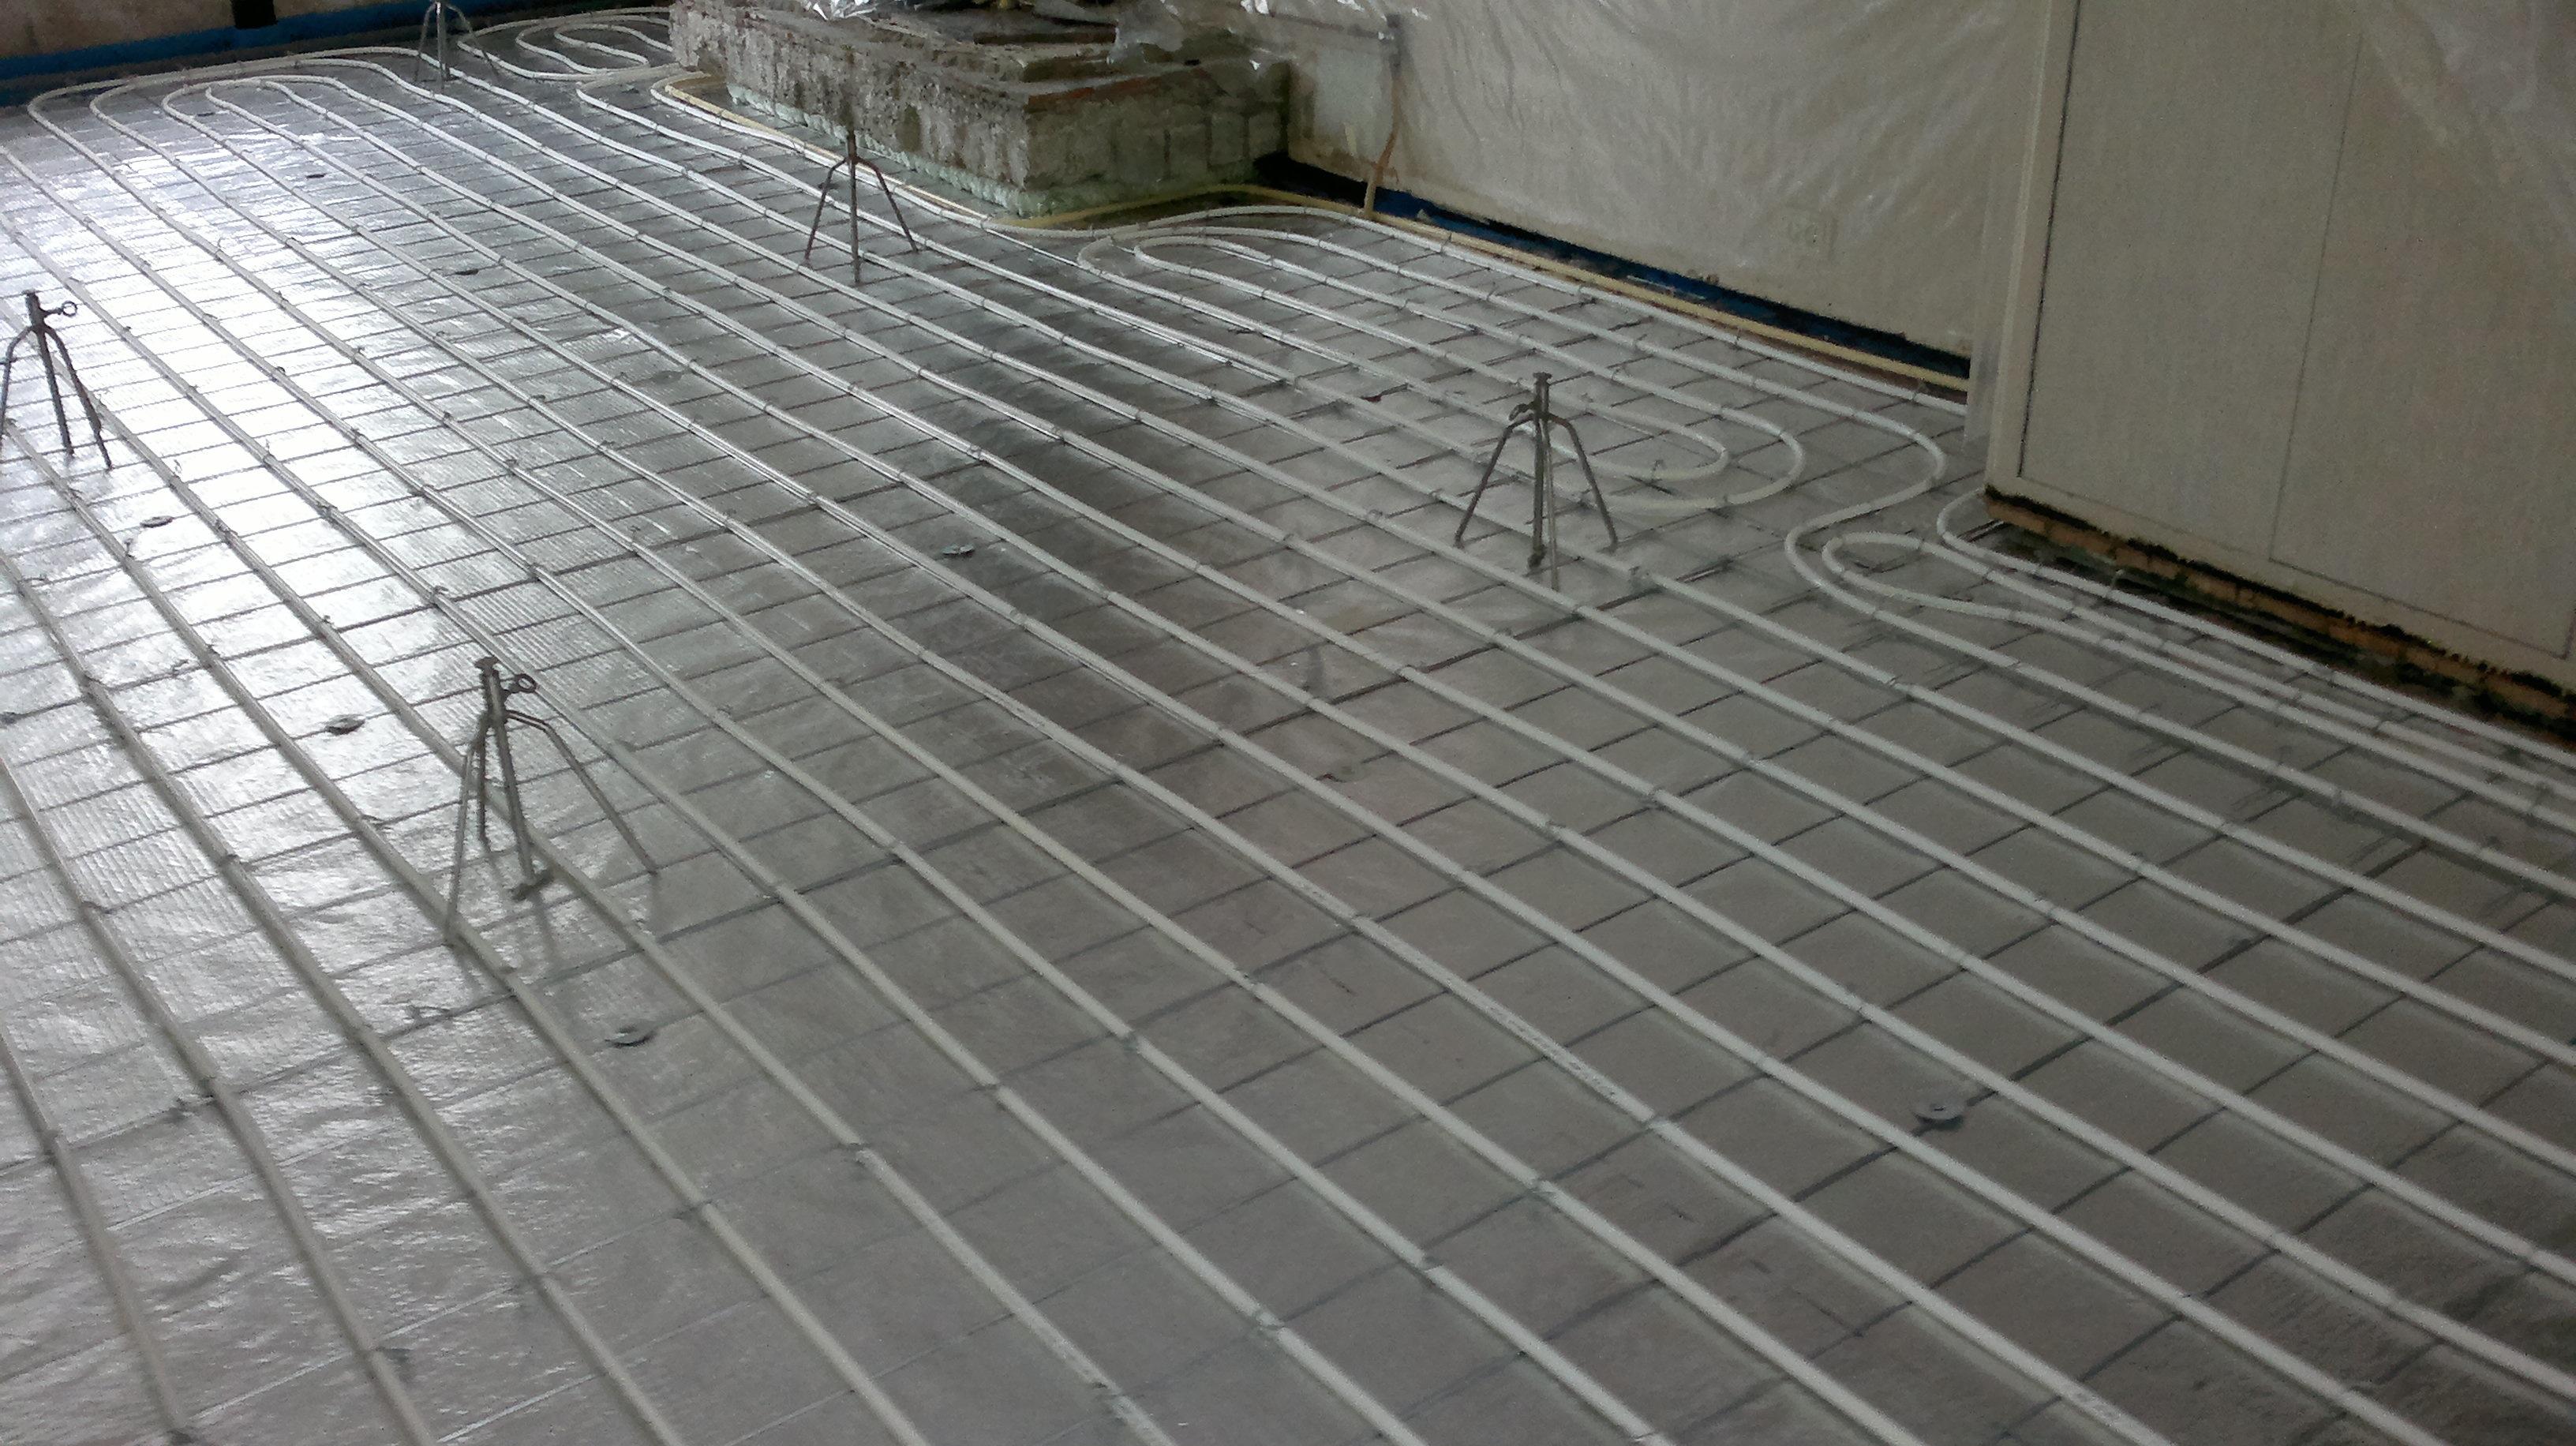 betonvloer storten kosten interesting vloerbeton storten with betonvloer storten kosten trendy. Black Bedroom Furniture Sets. Home Design Ideas